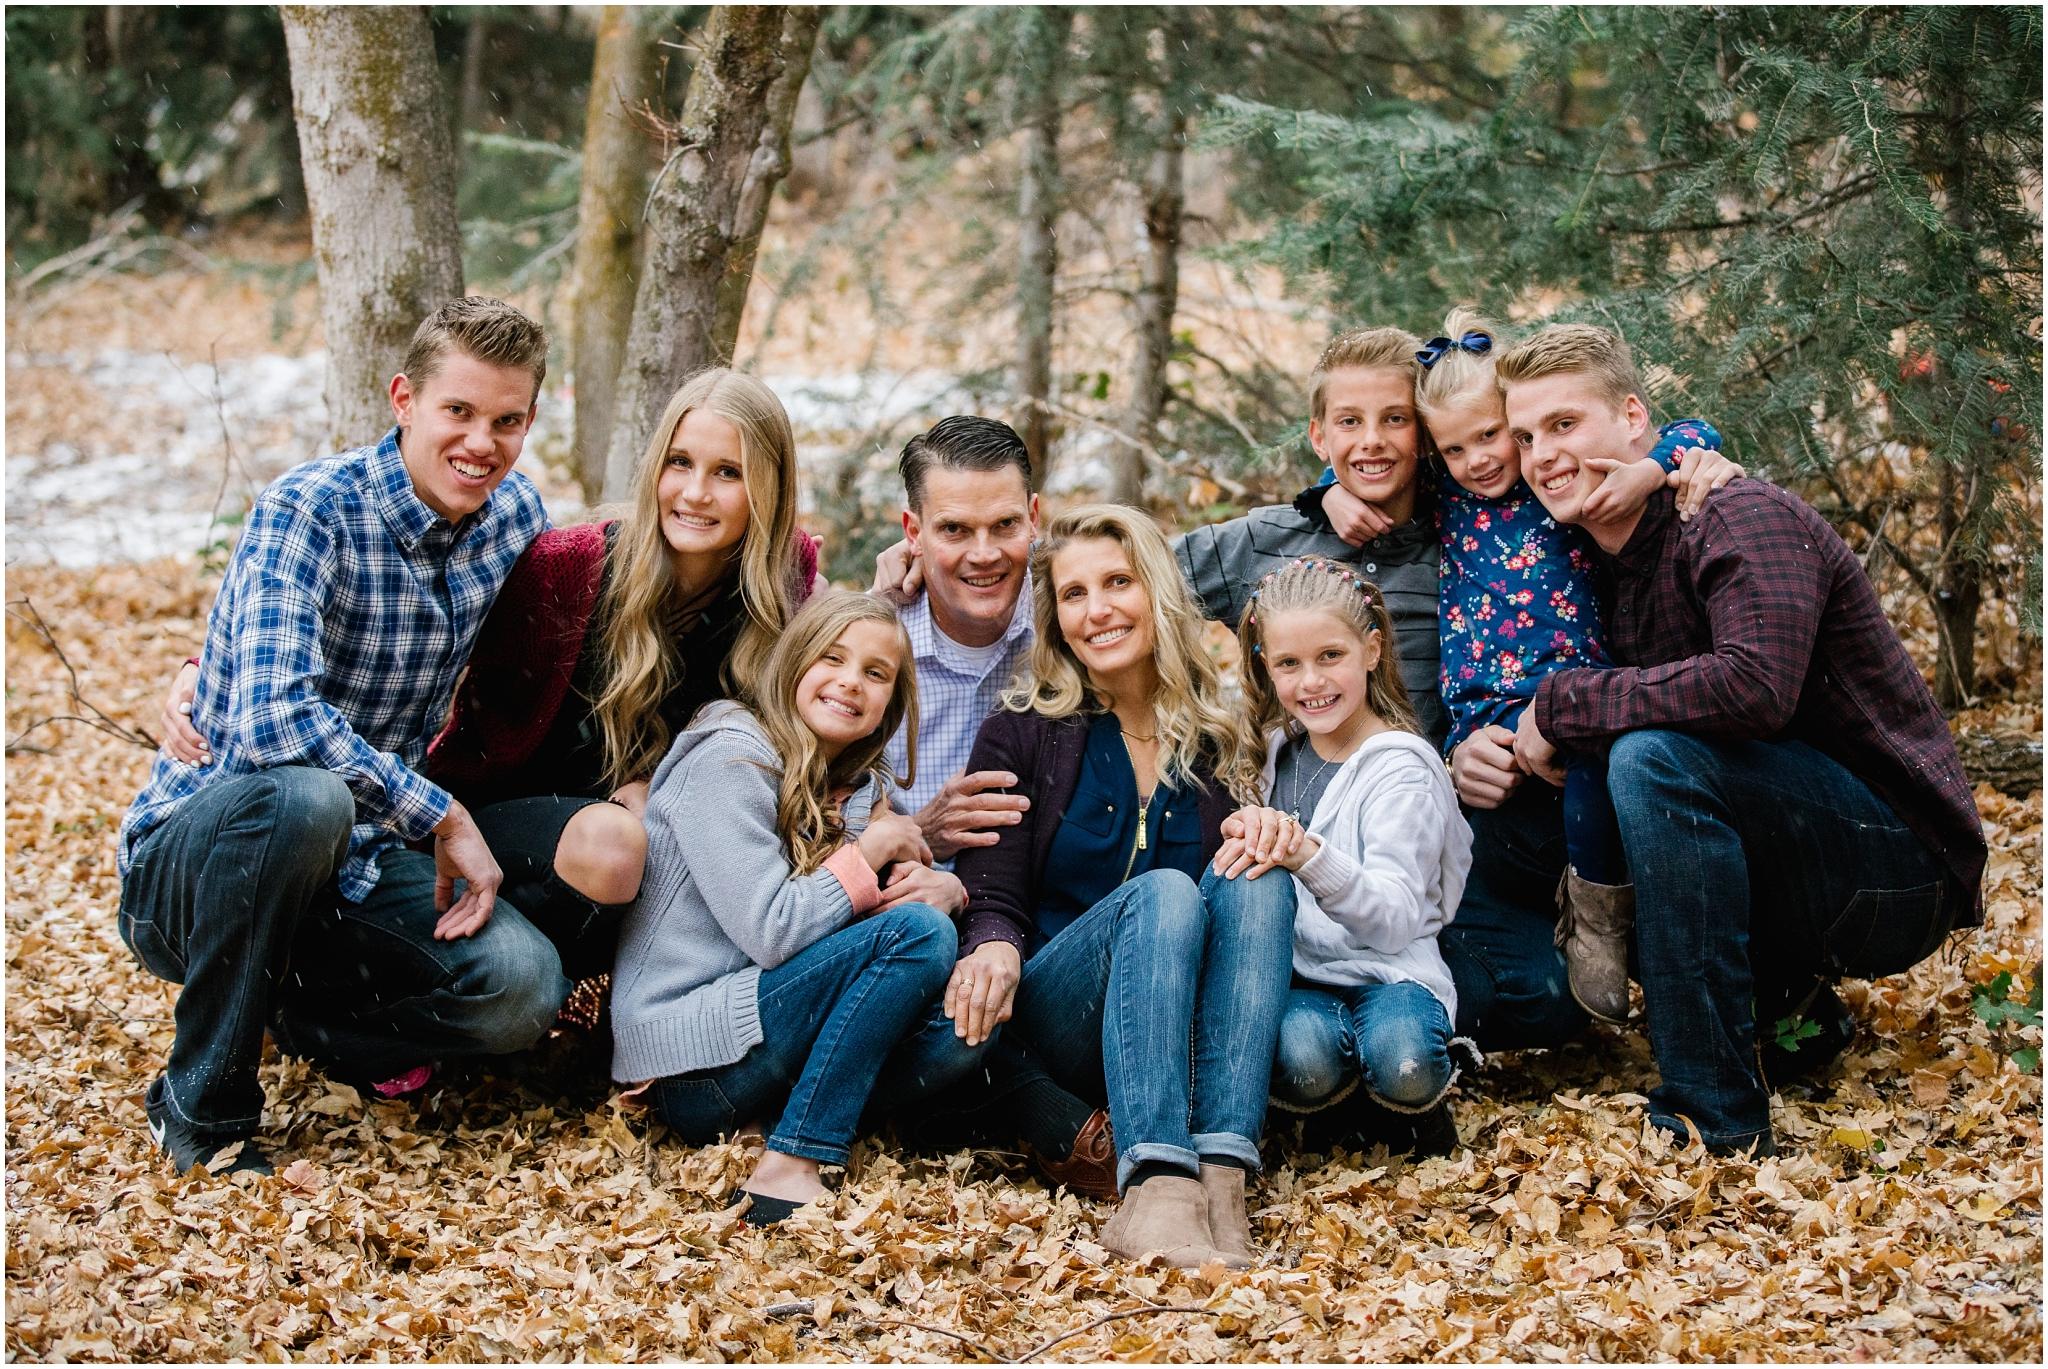 Vance-10_Lizzie-B-Imagery-Utah-Family-Photographer-Salt-Lake-City-Park-City-Utah-County-Payson-Canyon.jpg